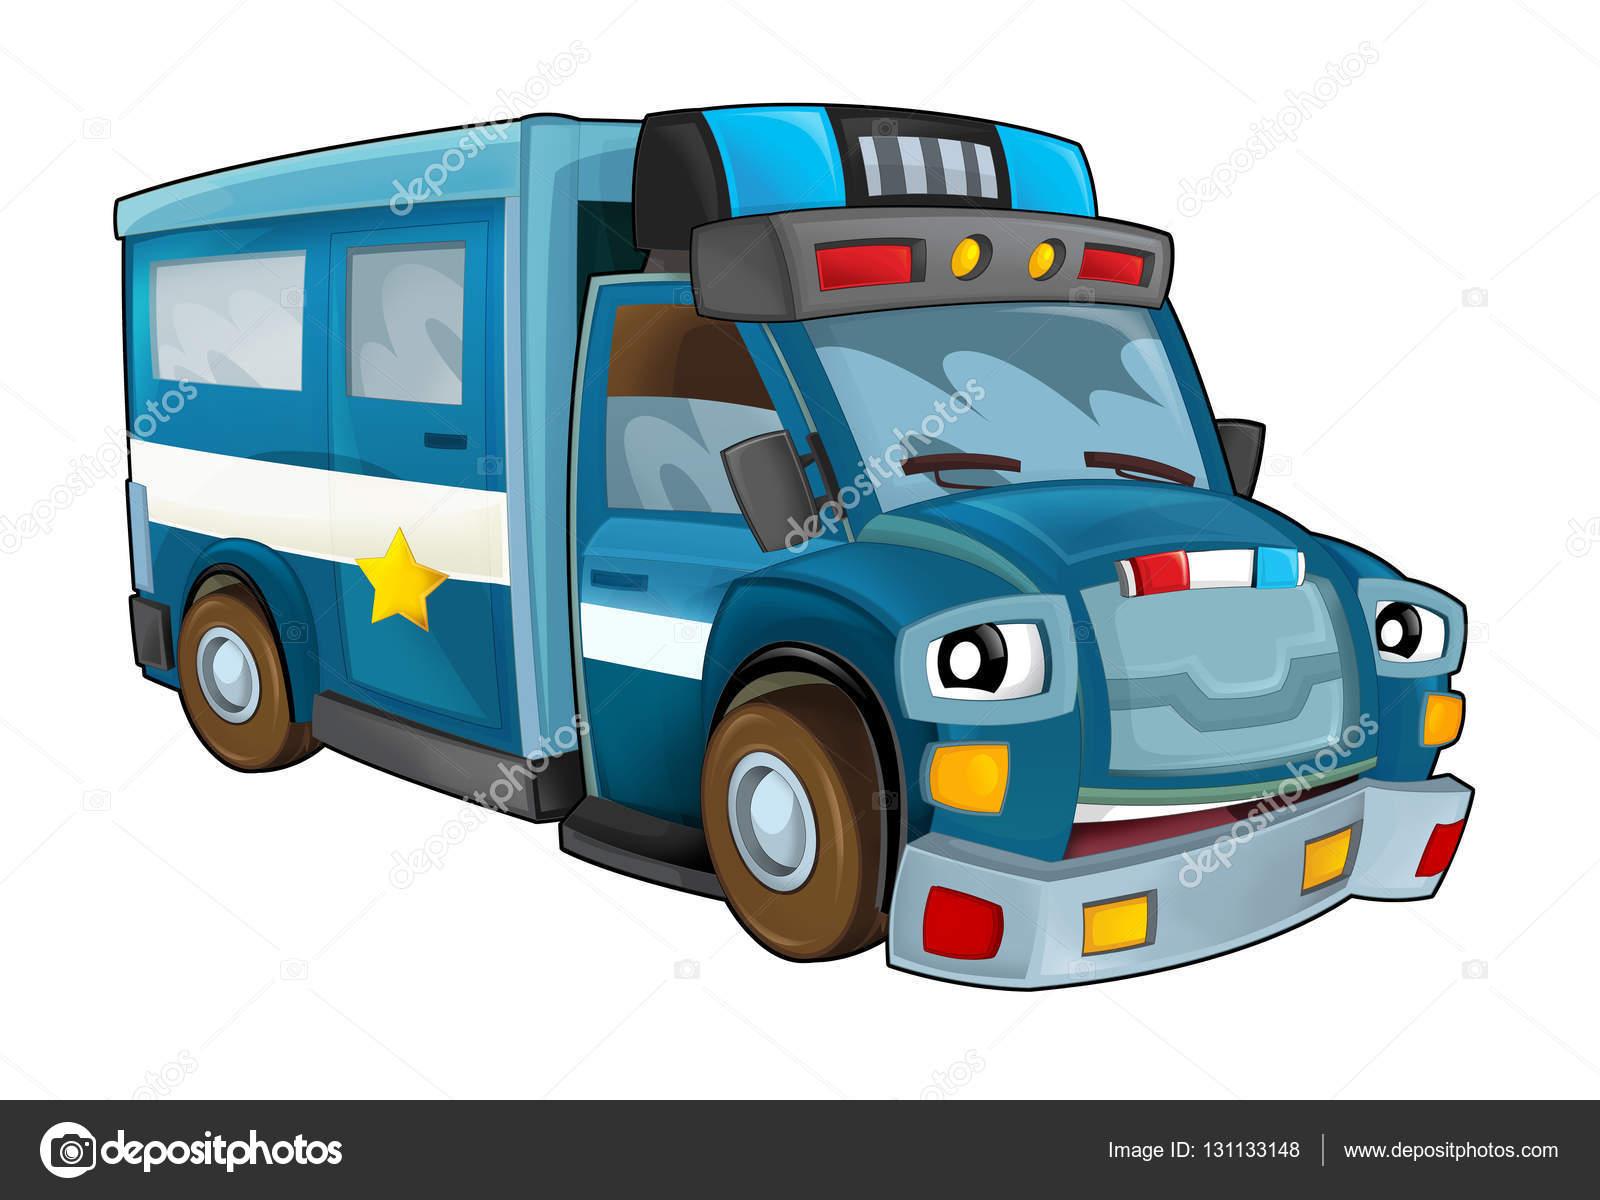 Voiture de police de dessin anim camion photographie illustrator hft 131133148 - Voiture police dessin anime ...